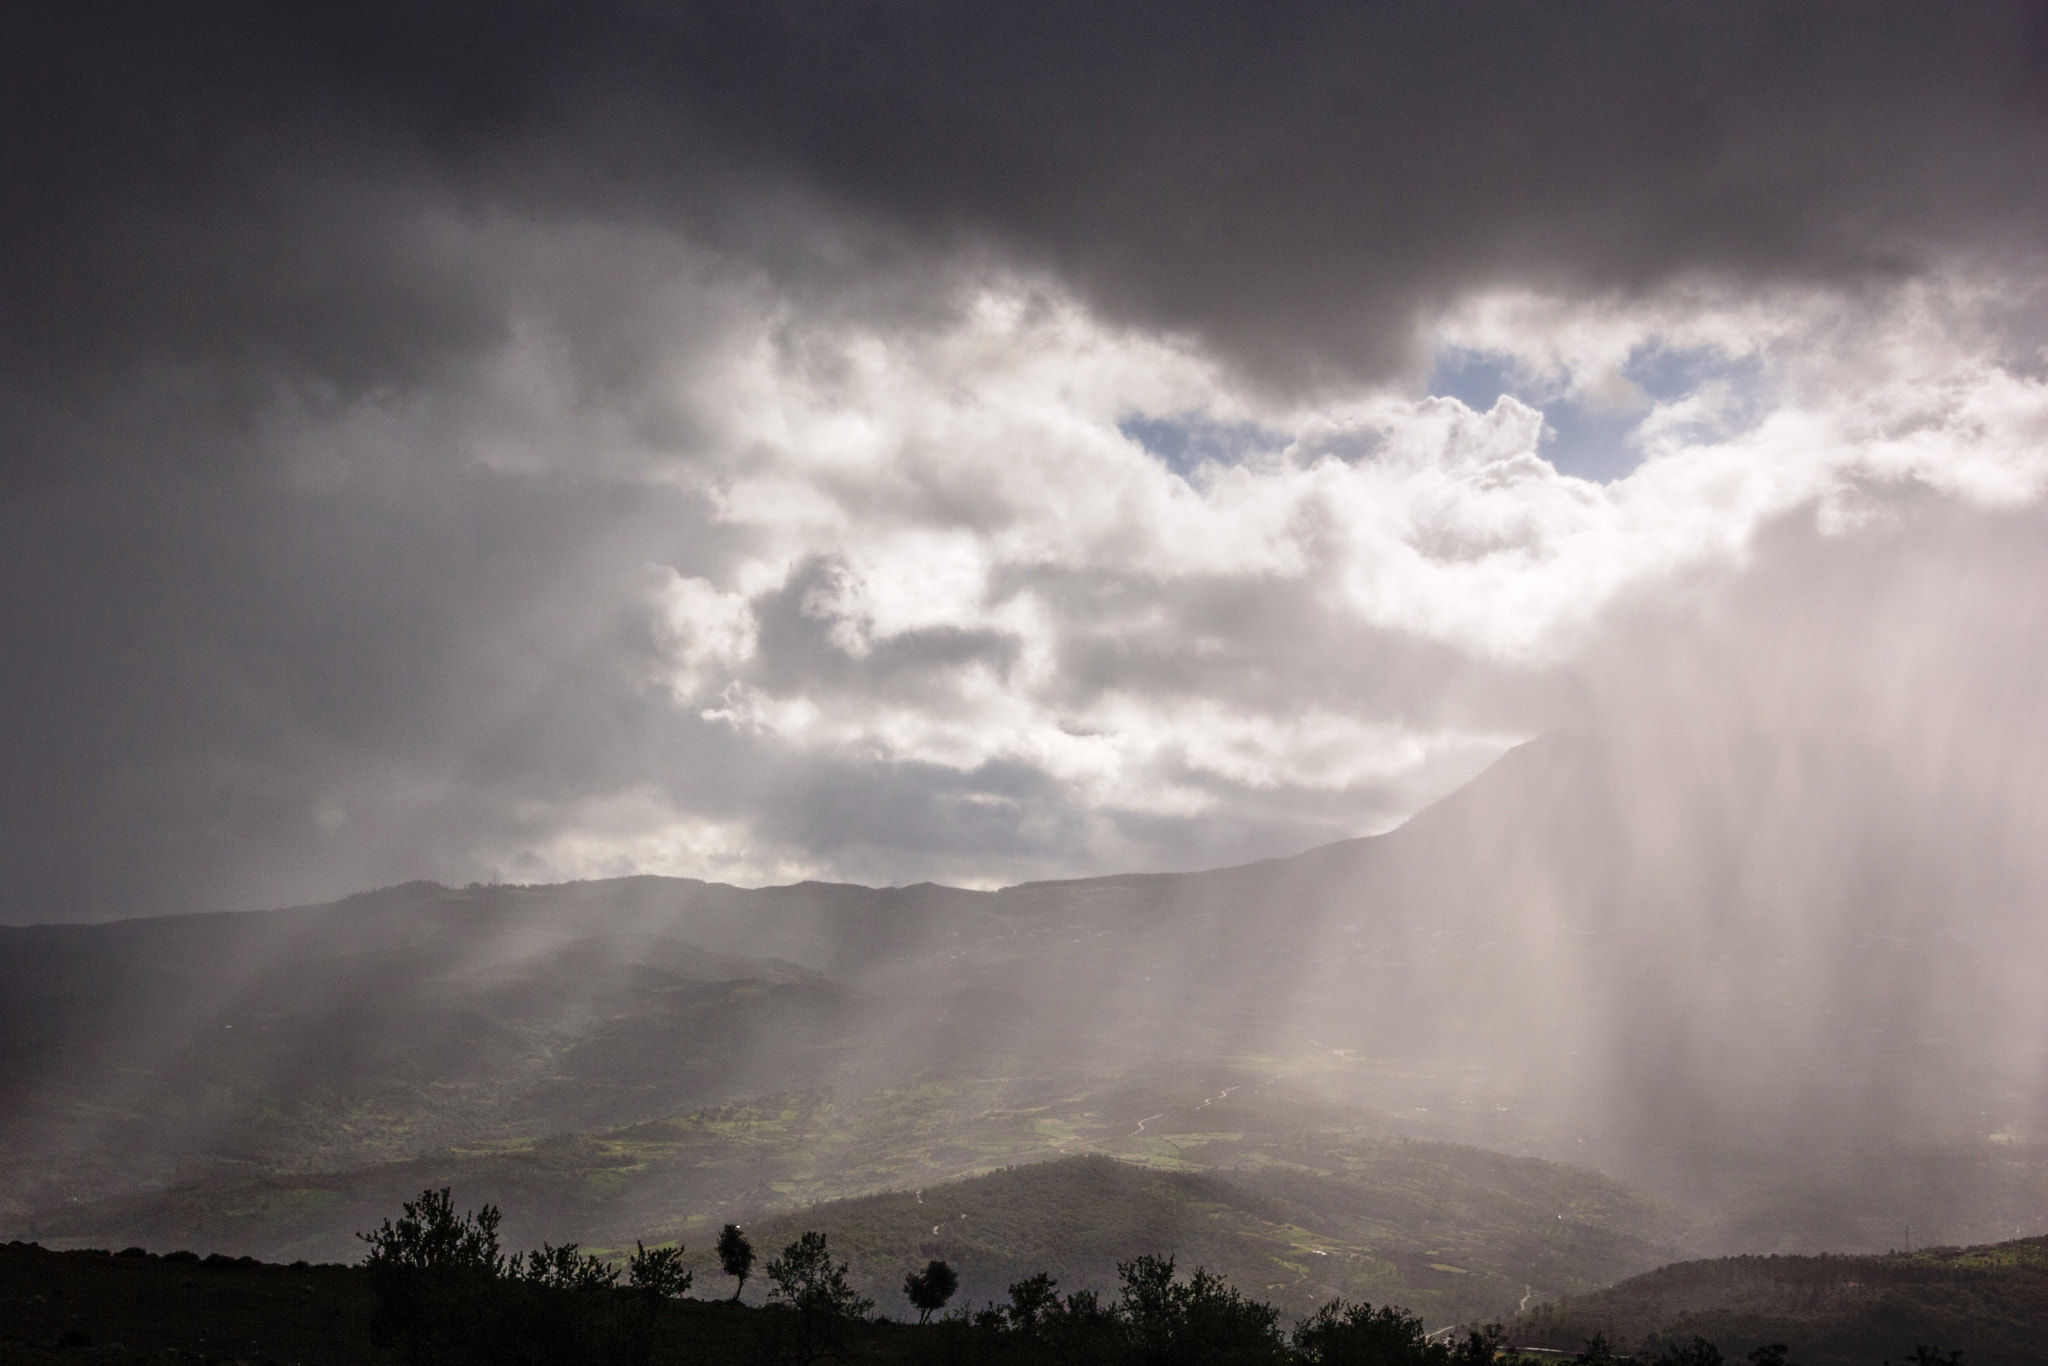 Rain above the mountains